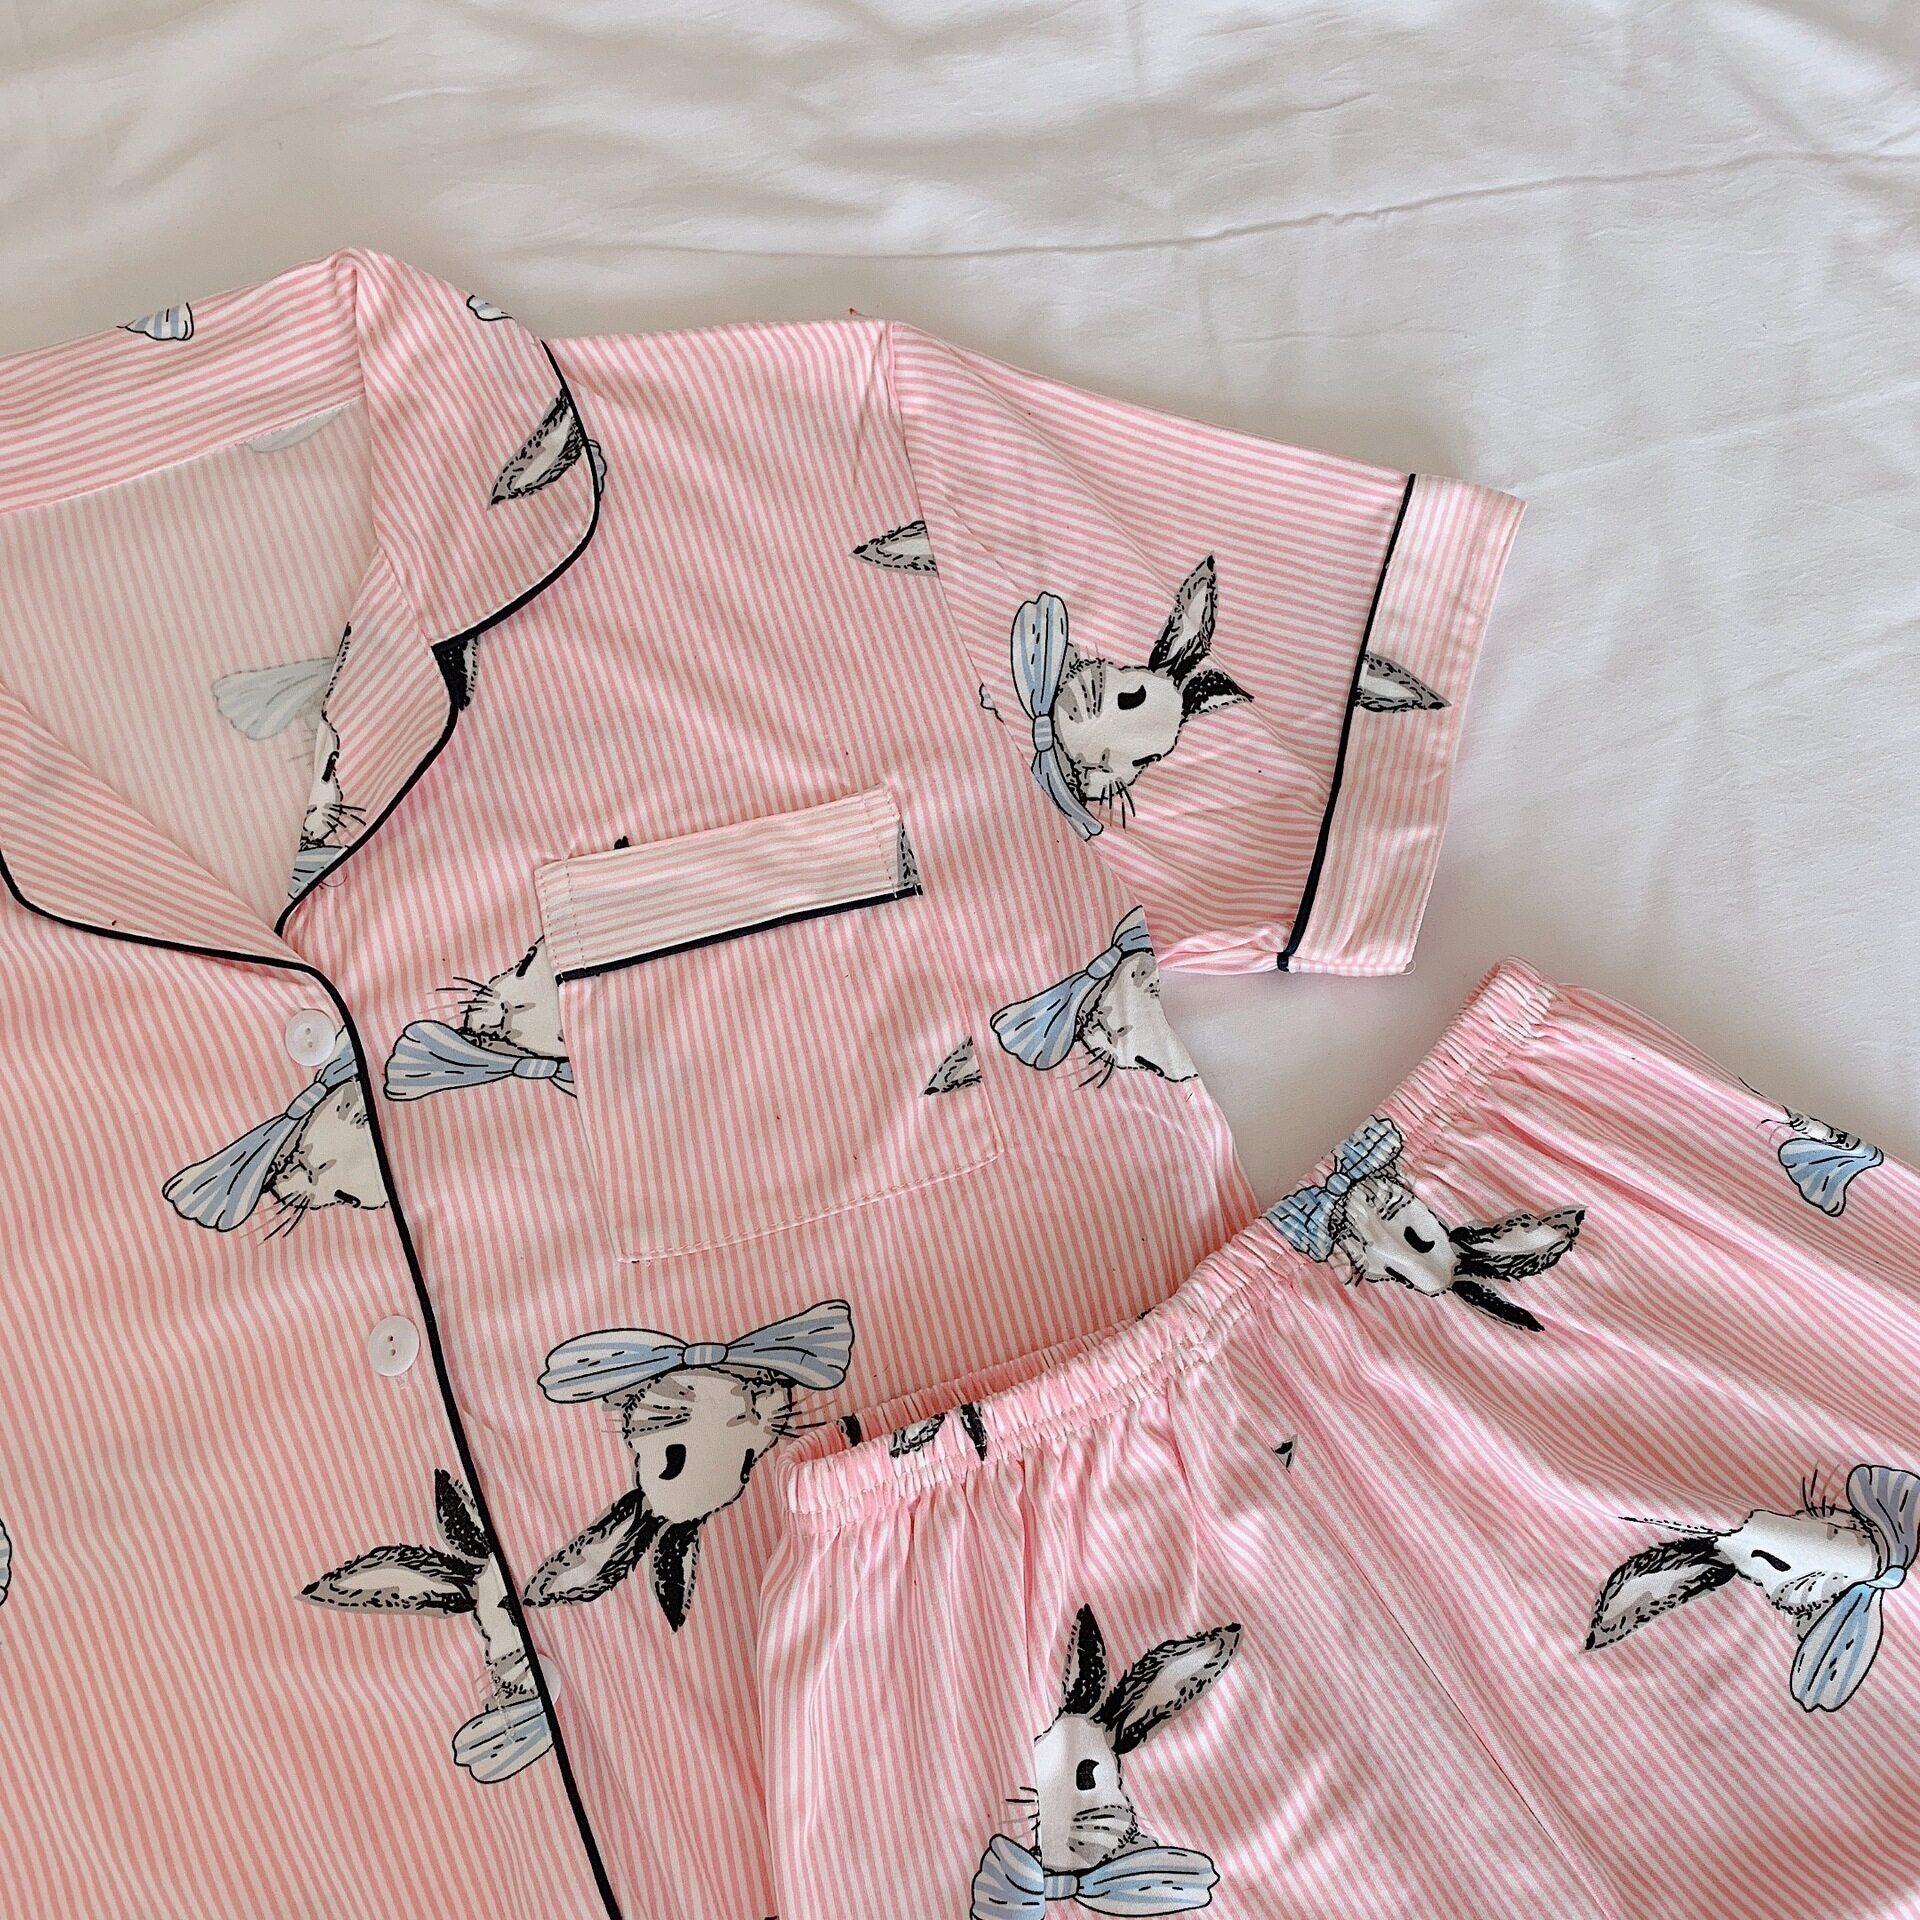 Women Short Sleeve Short Pants Cartoon Cotton Sleepwear Pajamas Dress Cute Pajamas Nightwear Set of 2 ( Top + Pants )